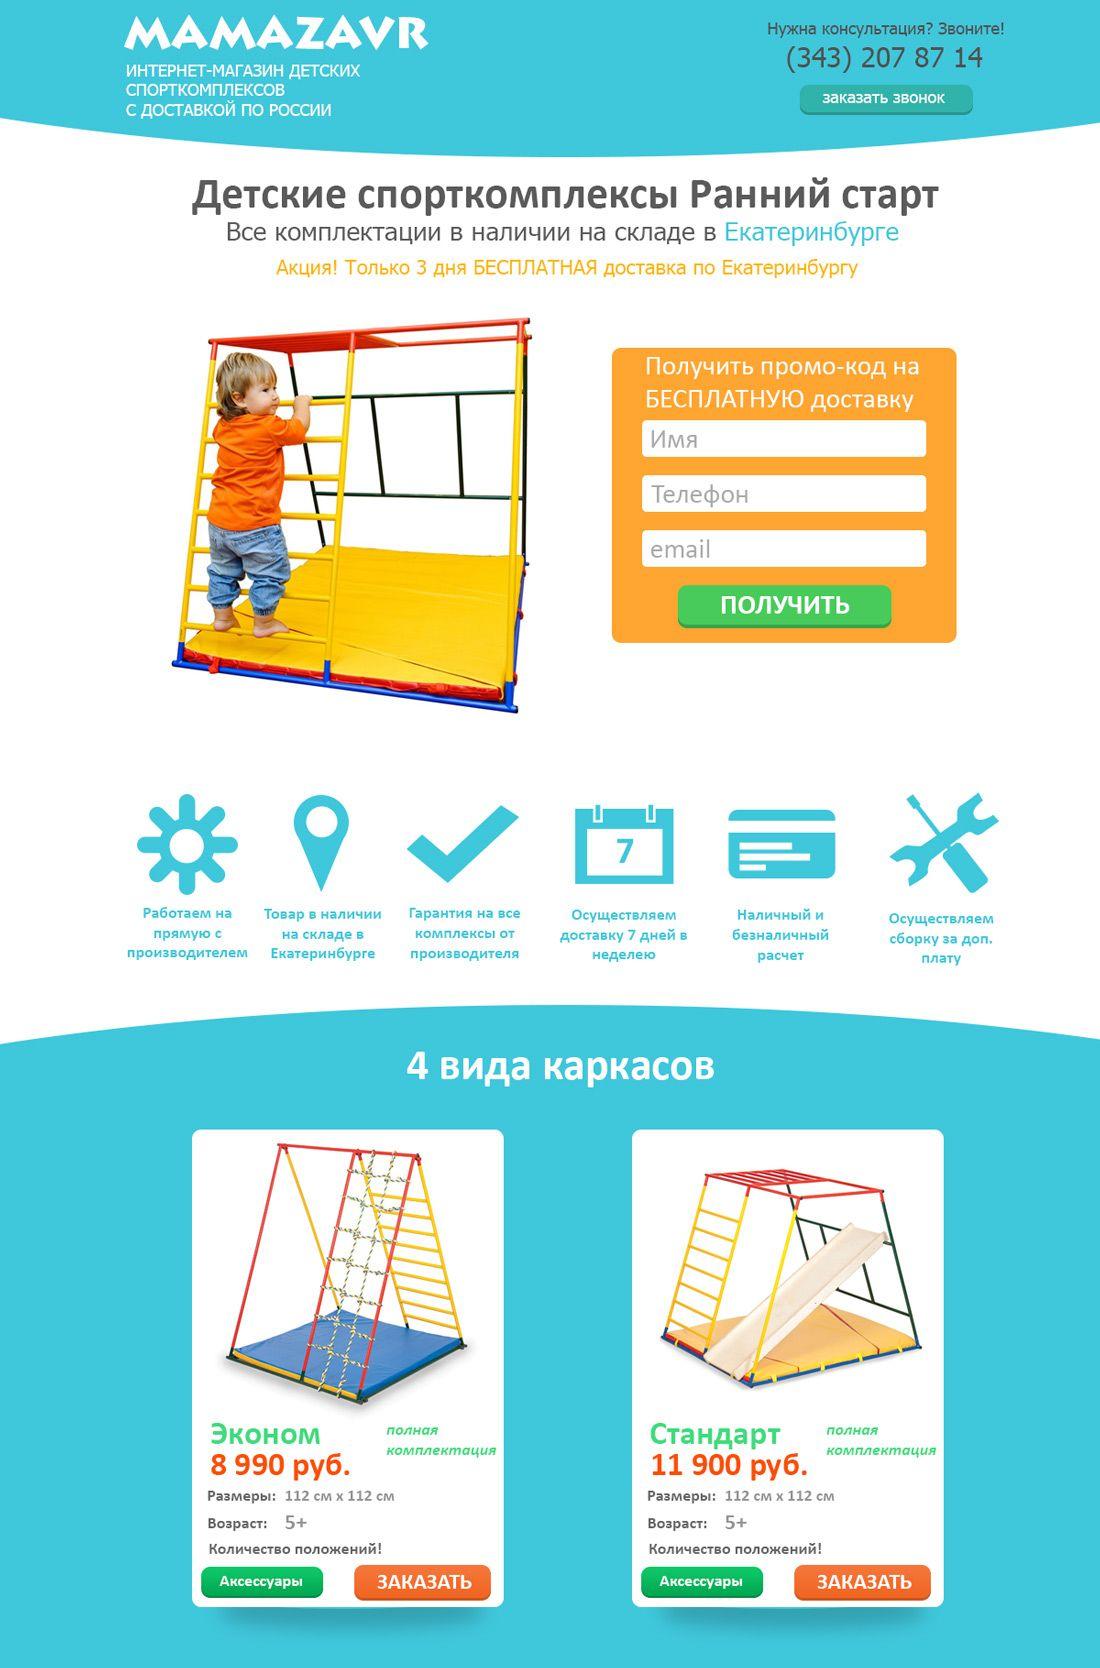 Редизайн landing page - дизайнер maxpetrov1